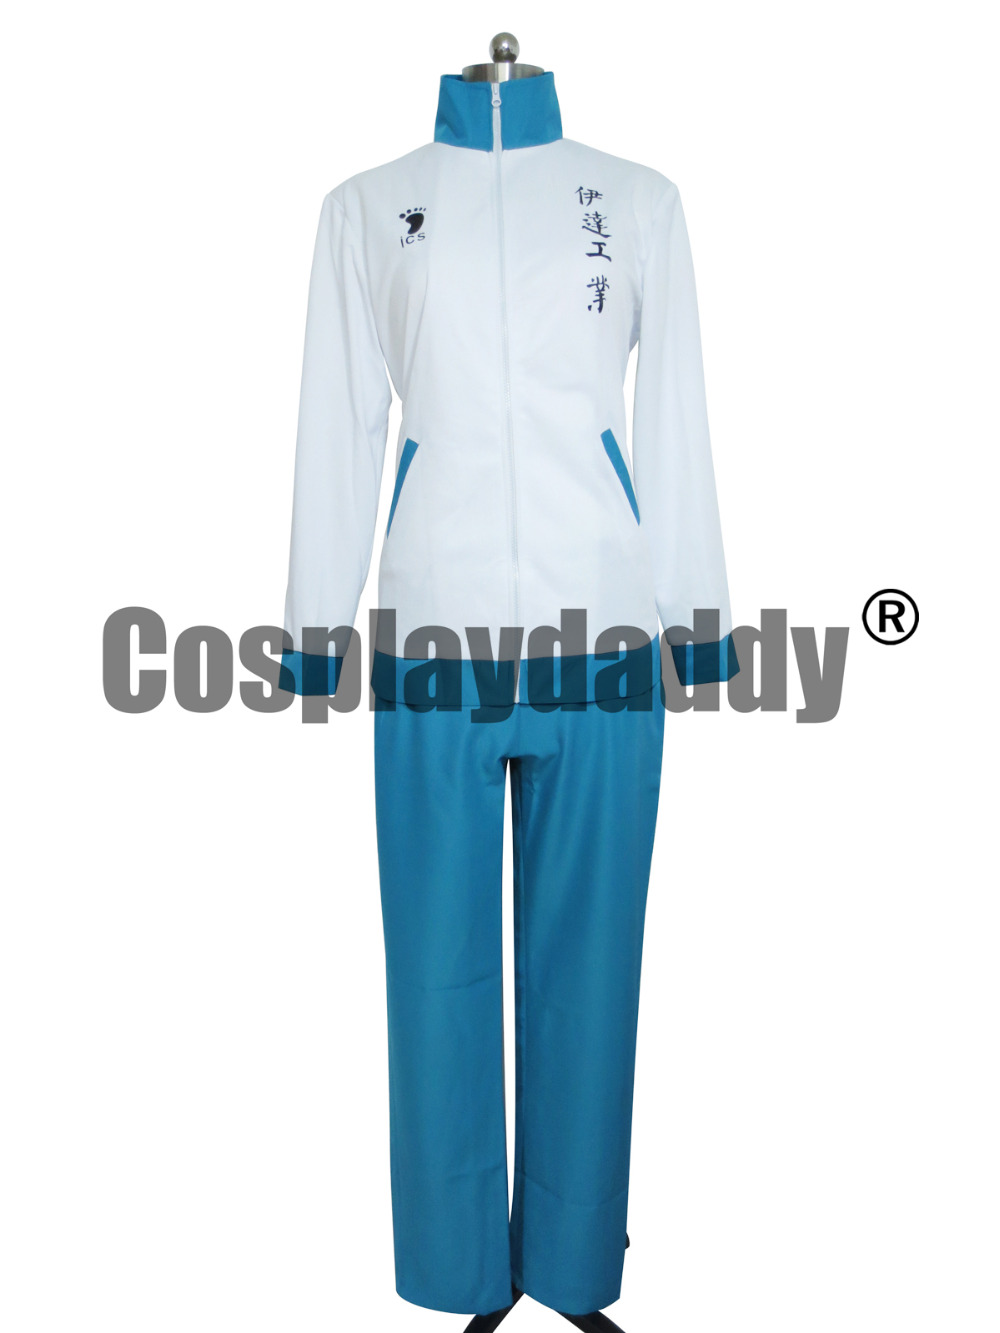 Haikyu! Date Tech High Sportovní oblečení Aone Takanobu Cosplay